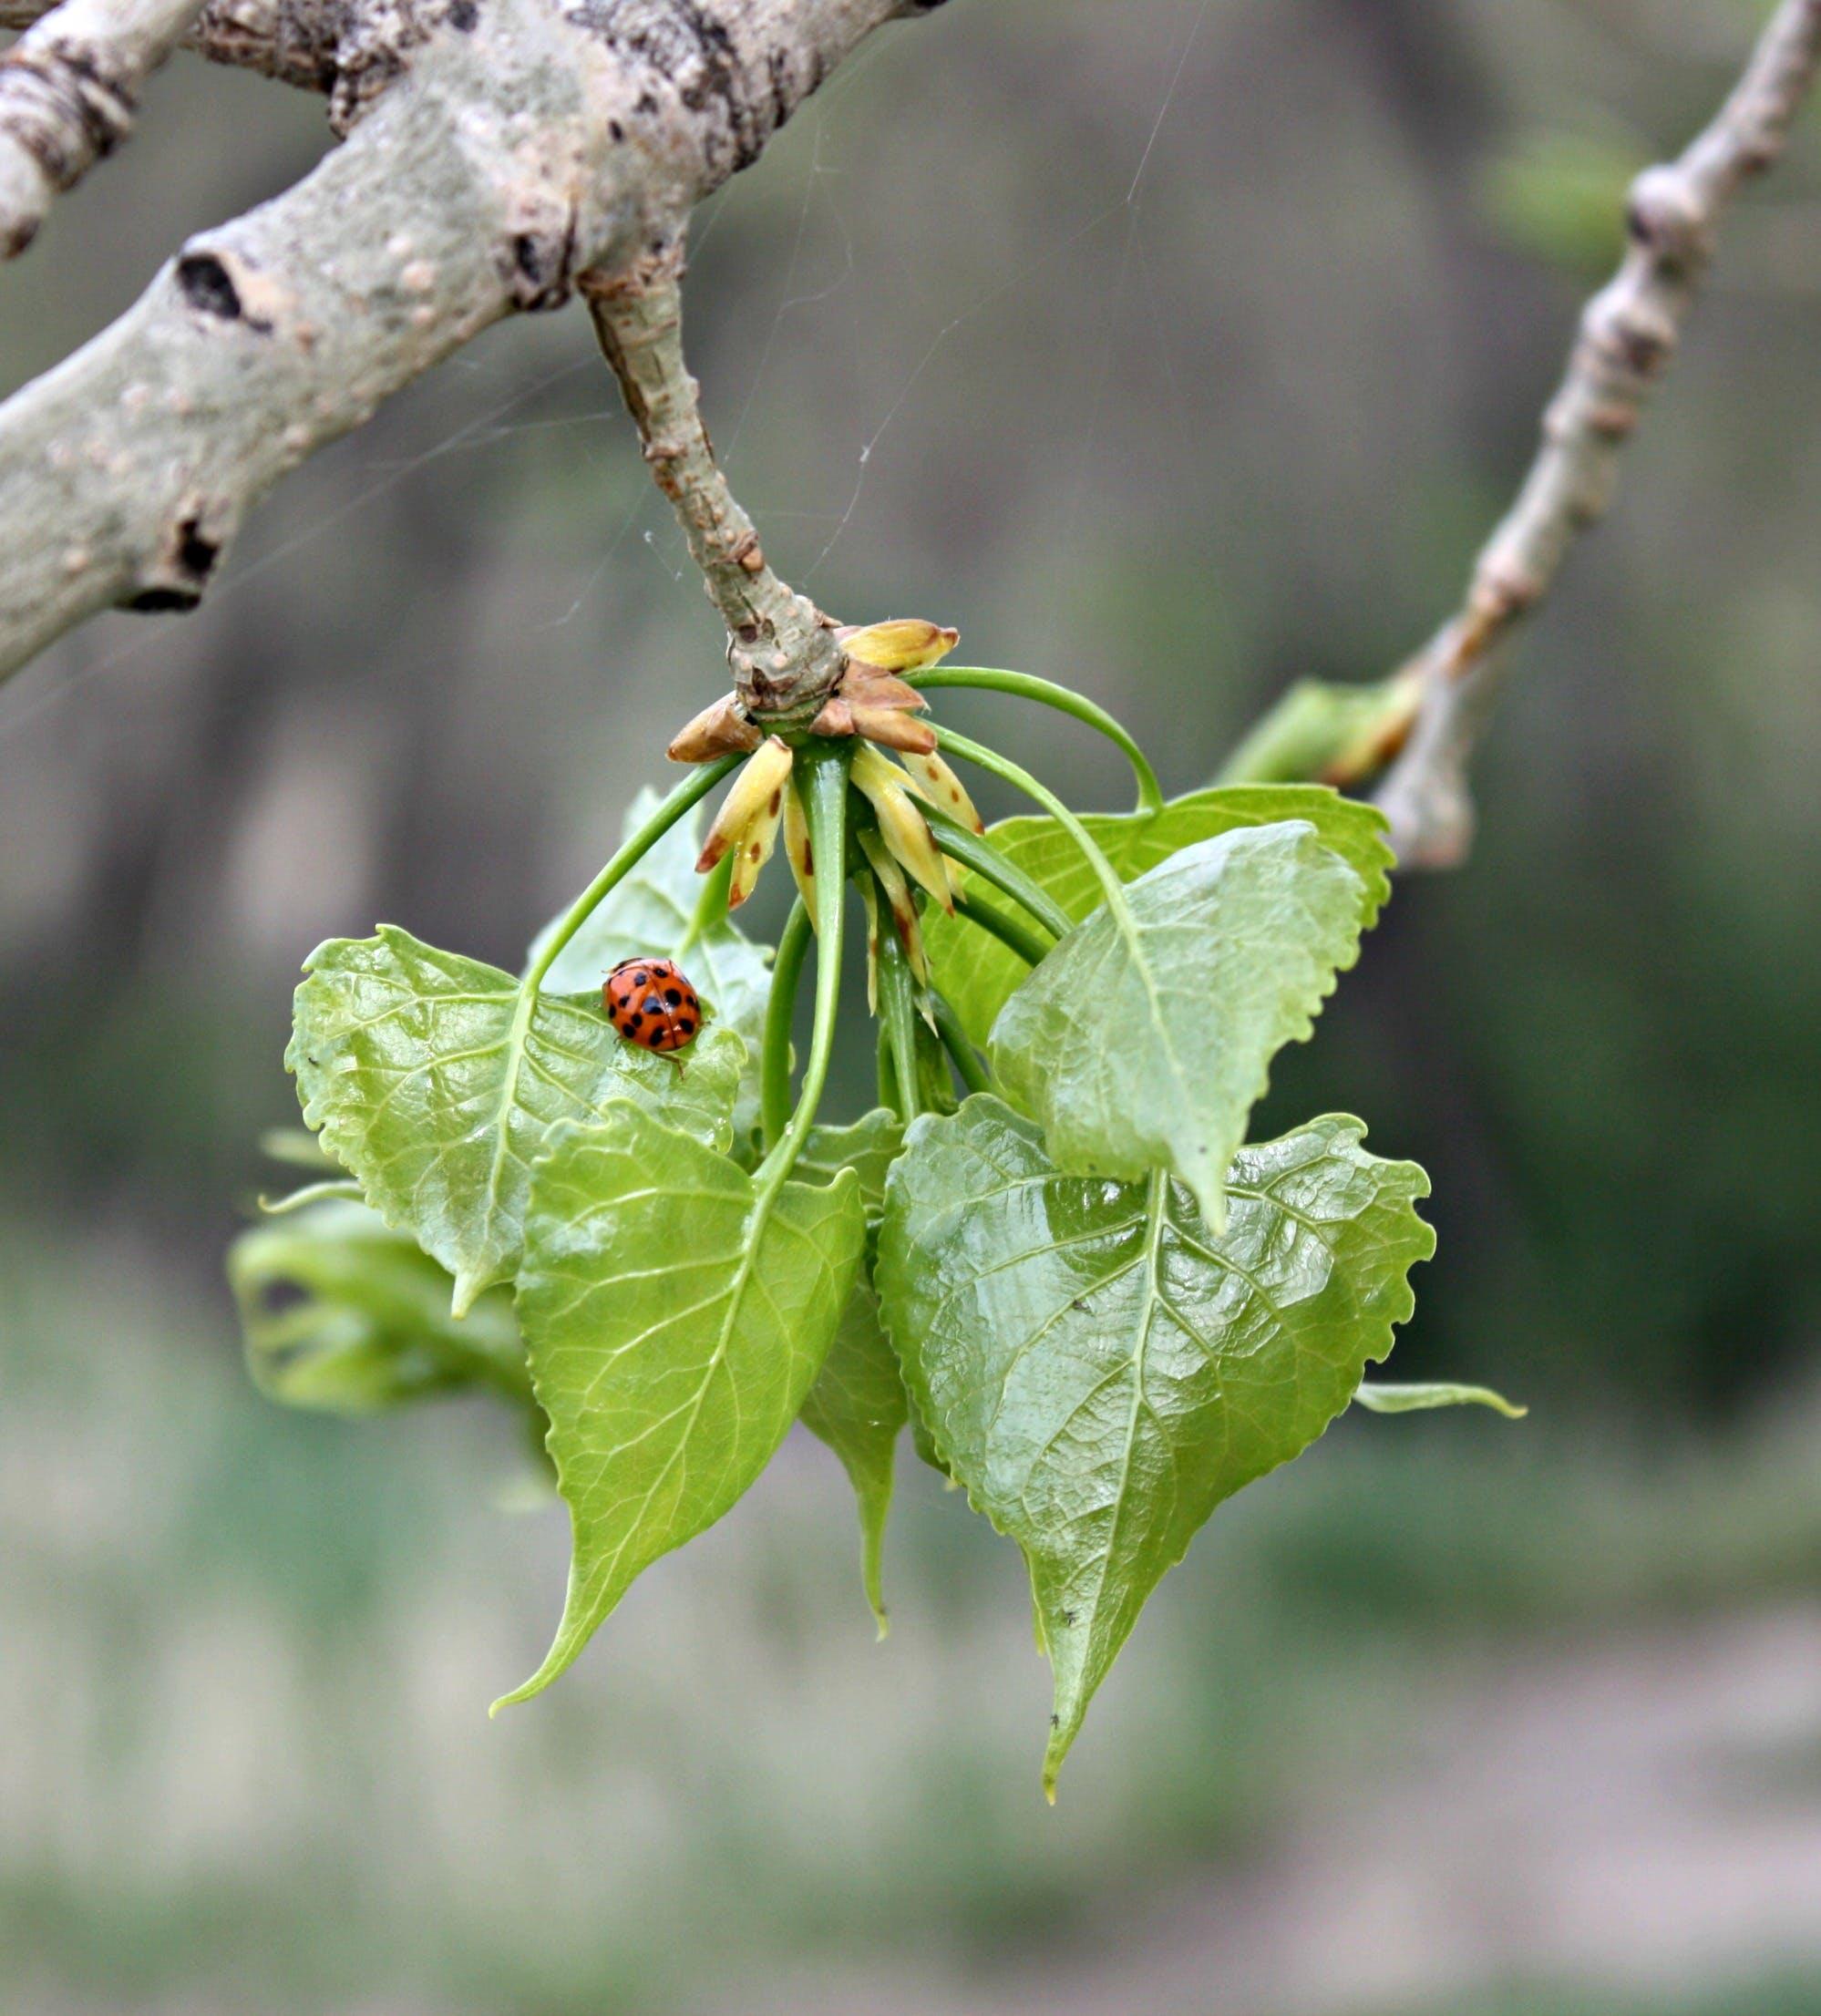 Free stock photo of green leaf, ladybeetle, spider web, sunny